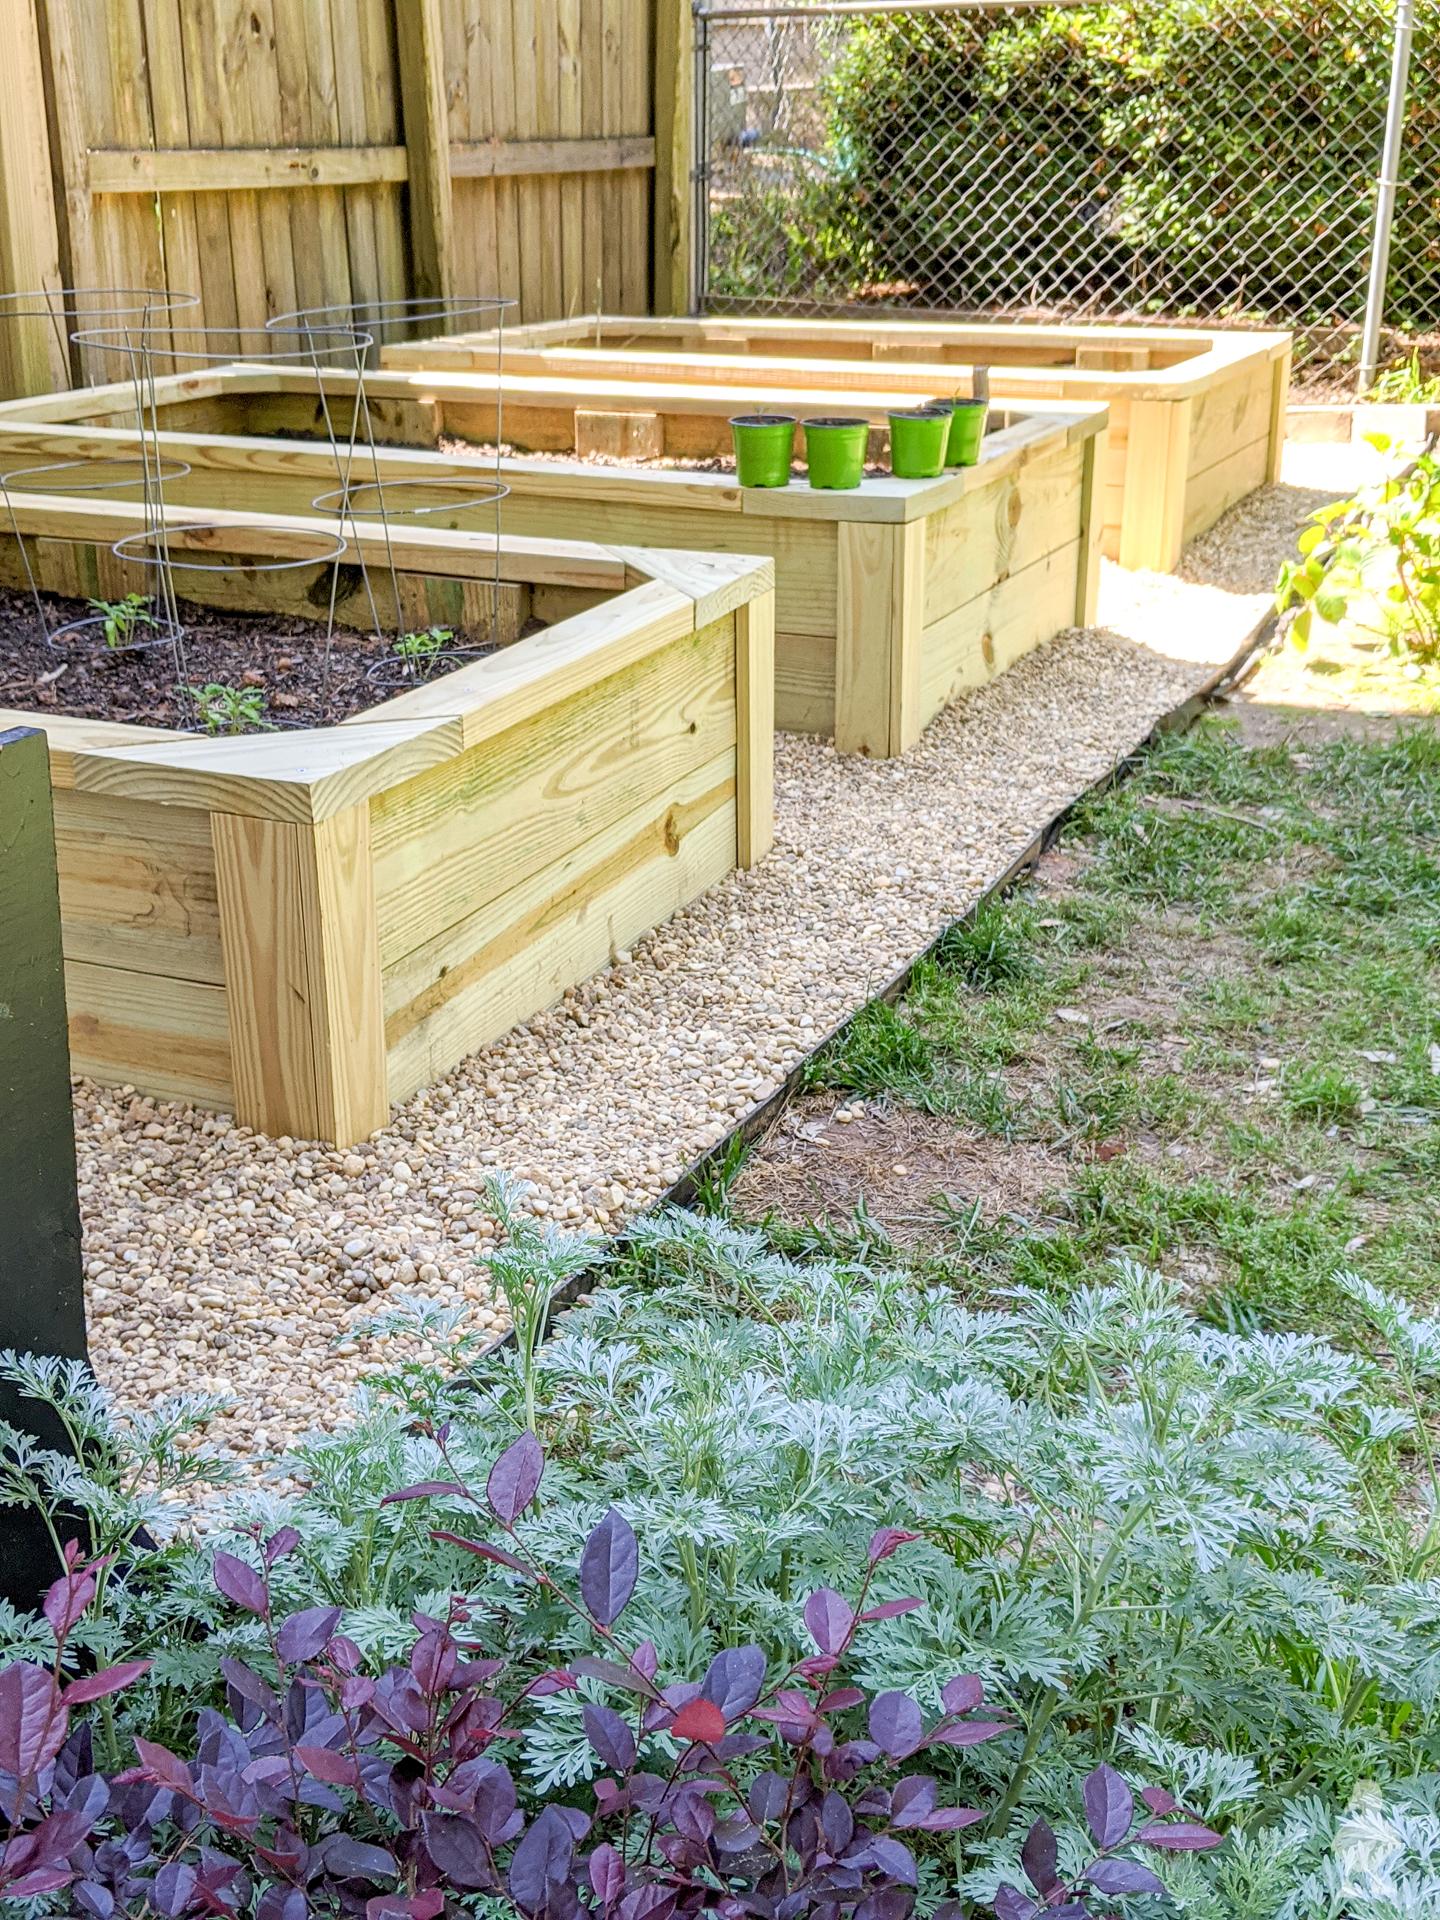 new garden beds in corner of back yard